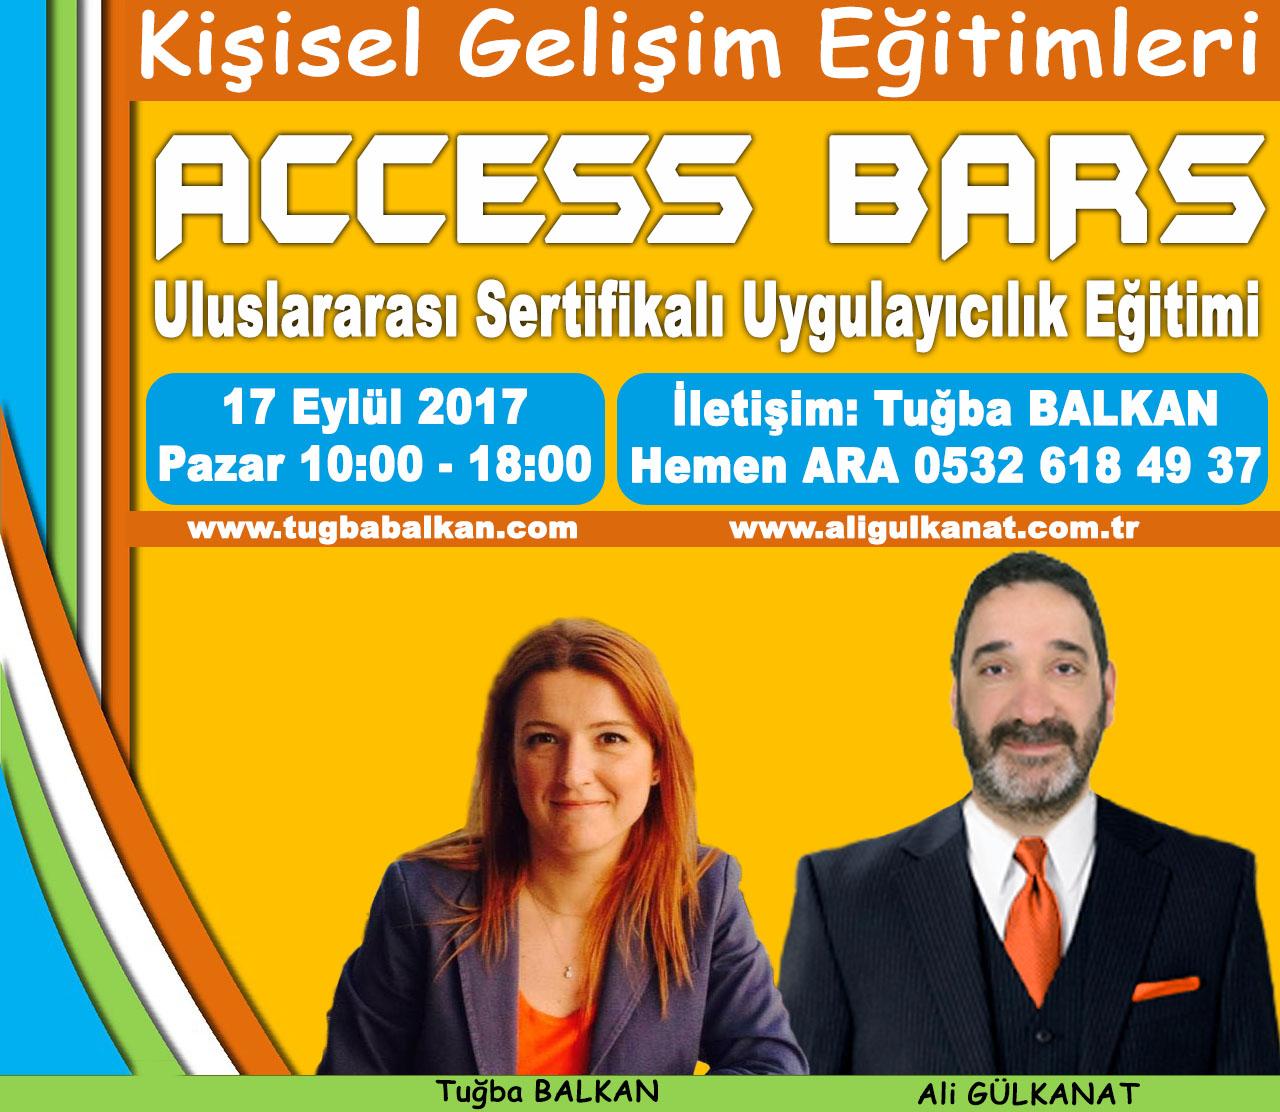 access-bars-tanitim-17-eylul-1